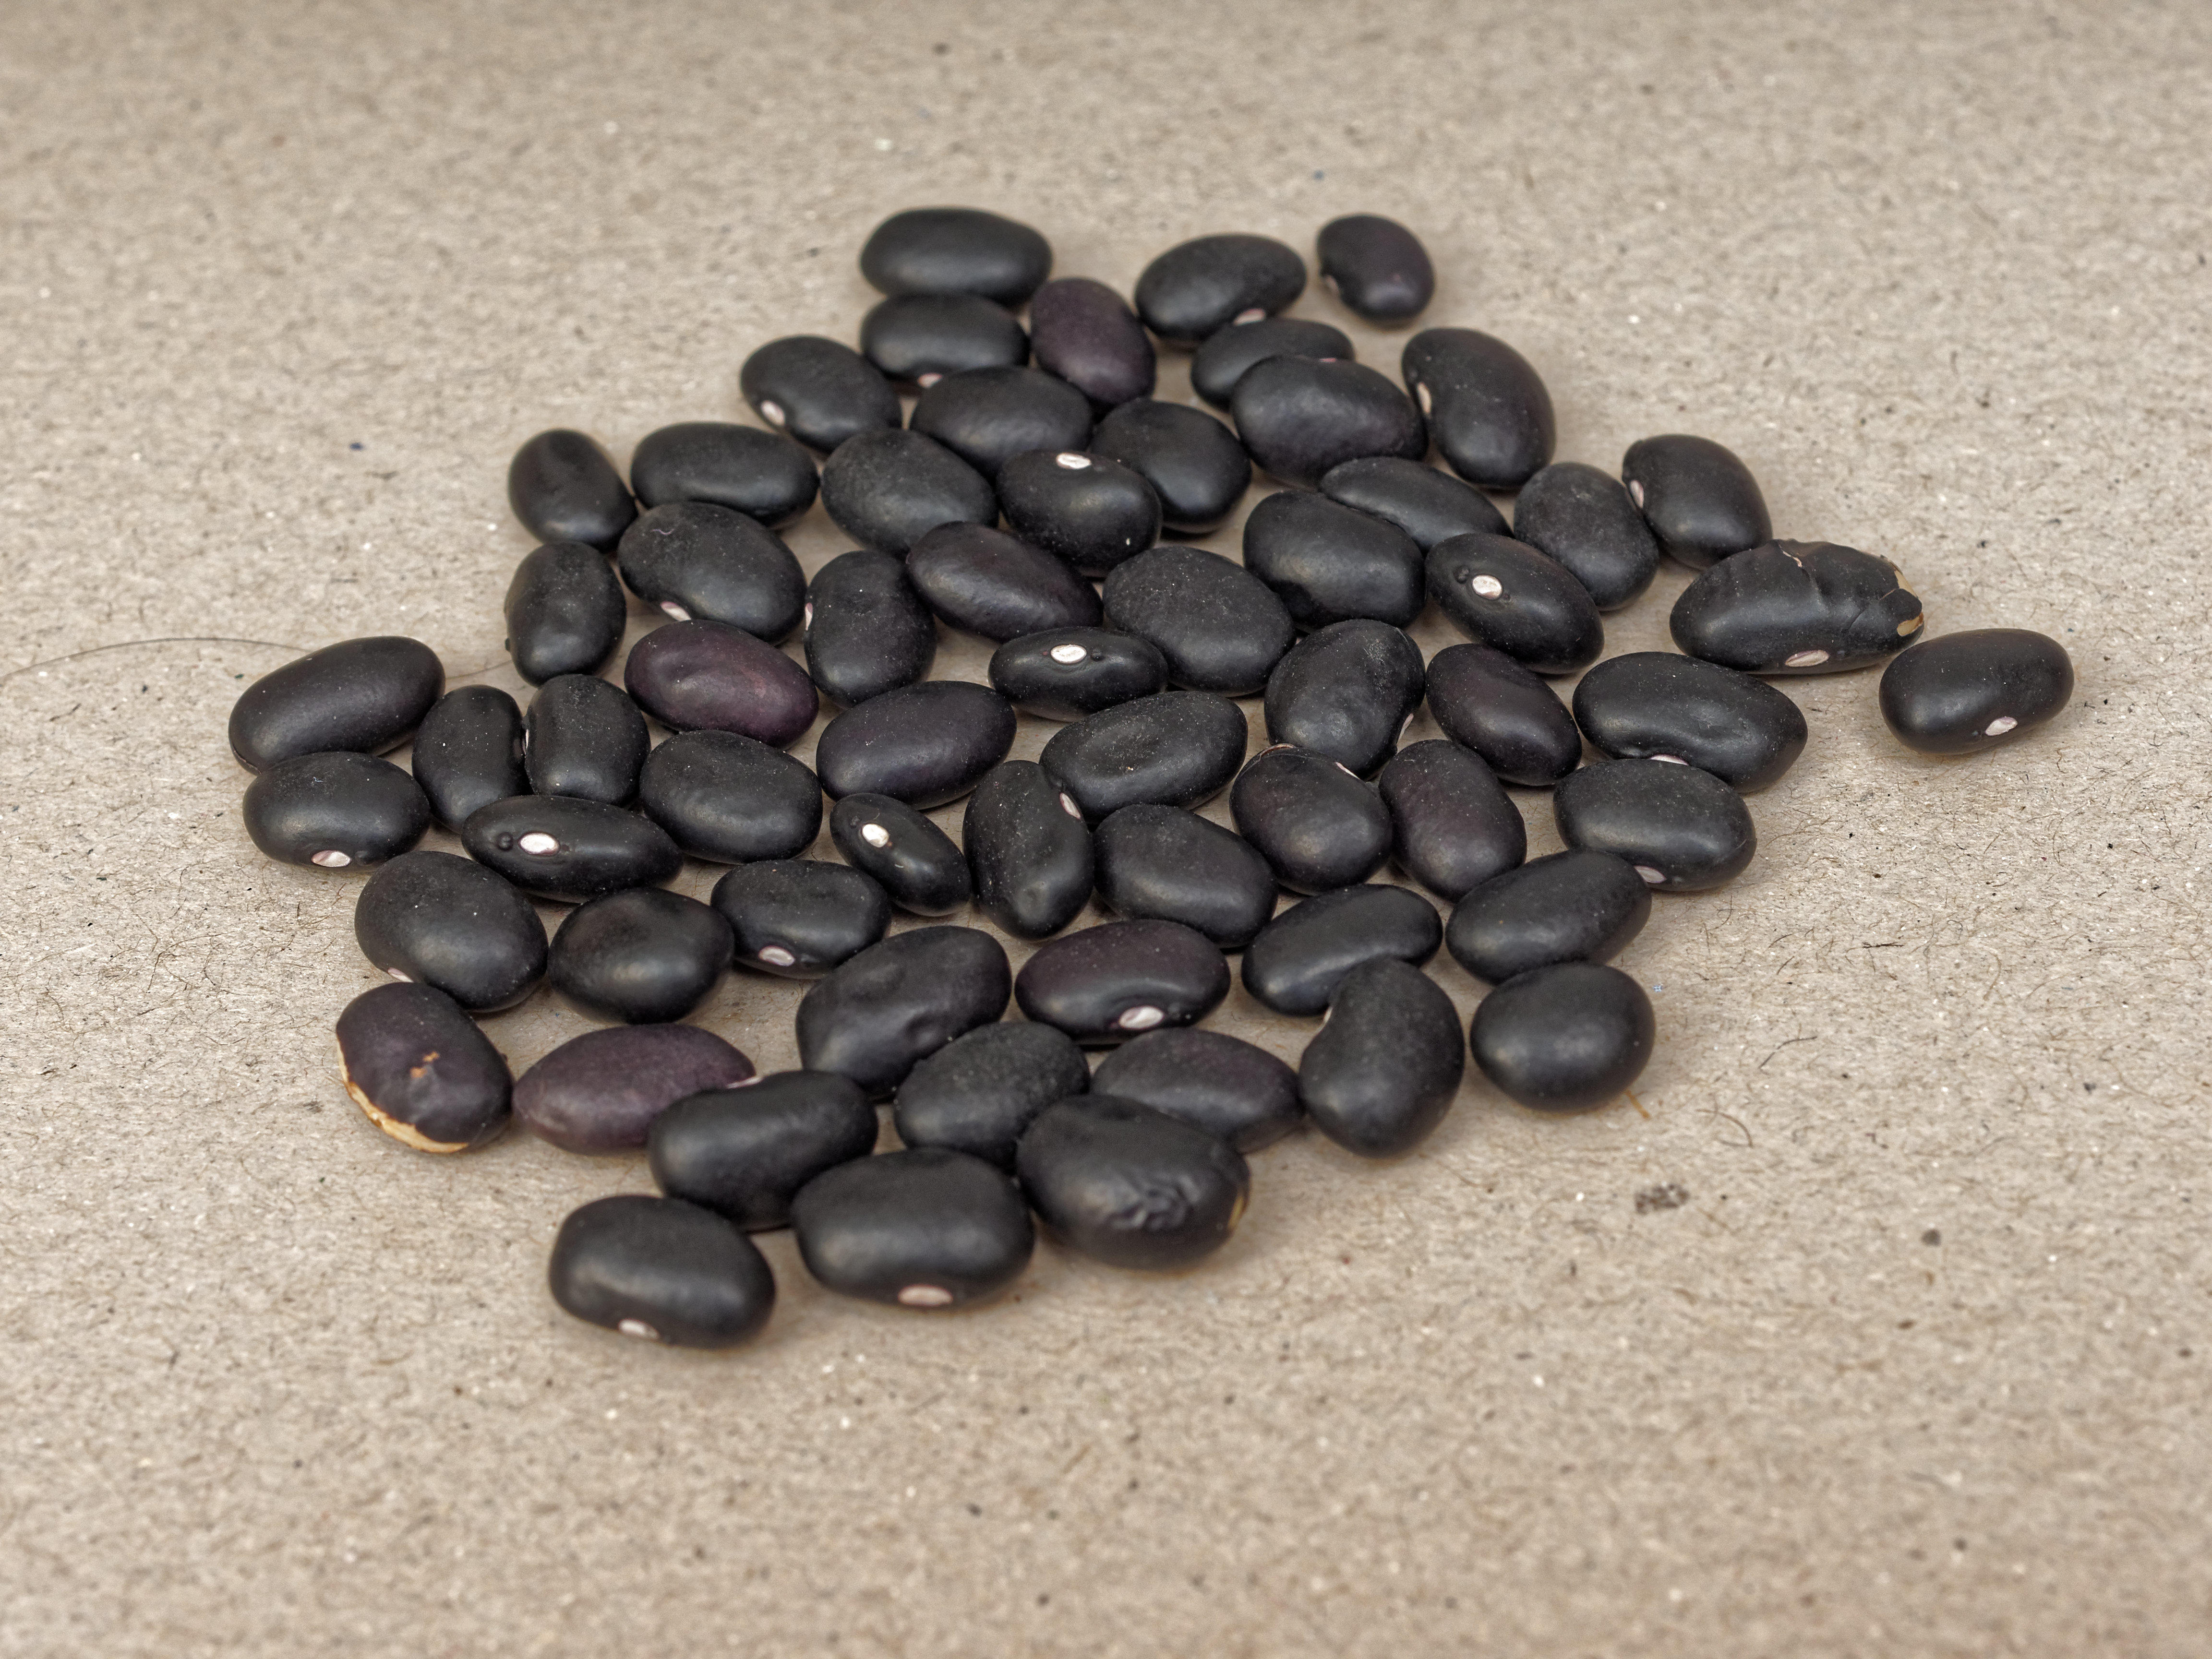 Beans-5.jpeg